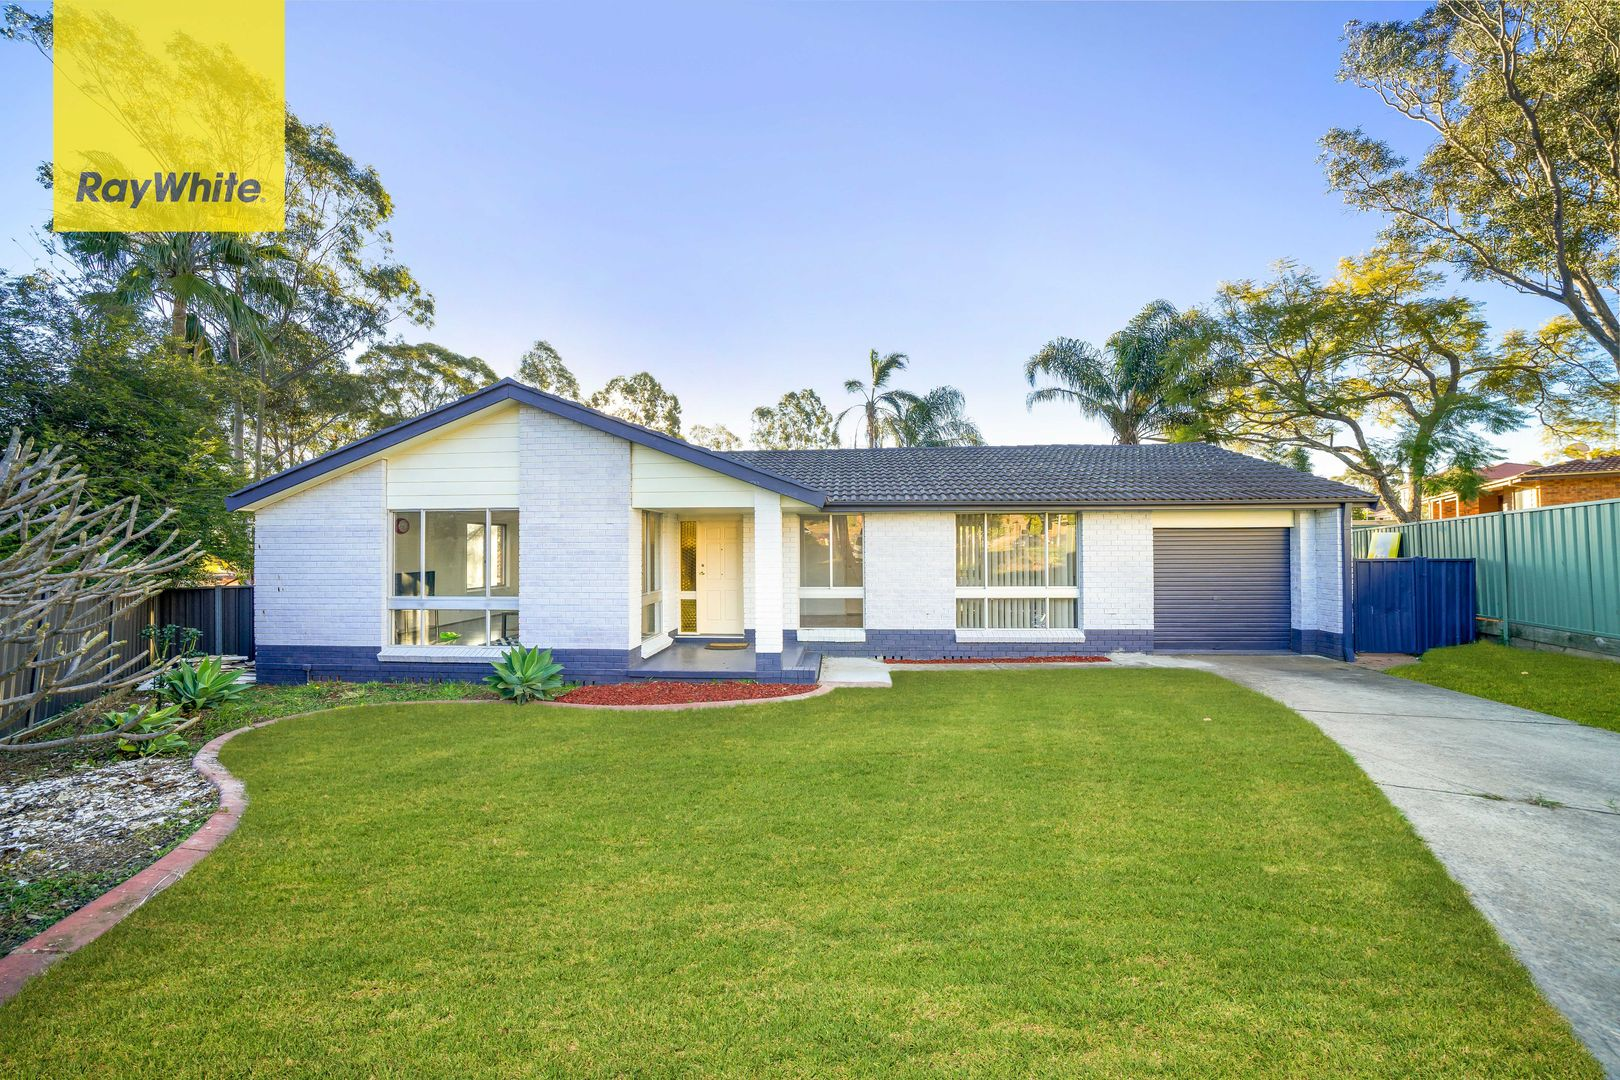 51 Randall avenue,, Minto NSW 2566, Image 0